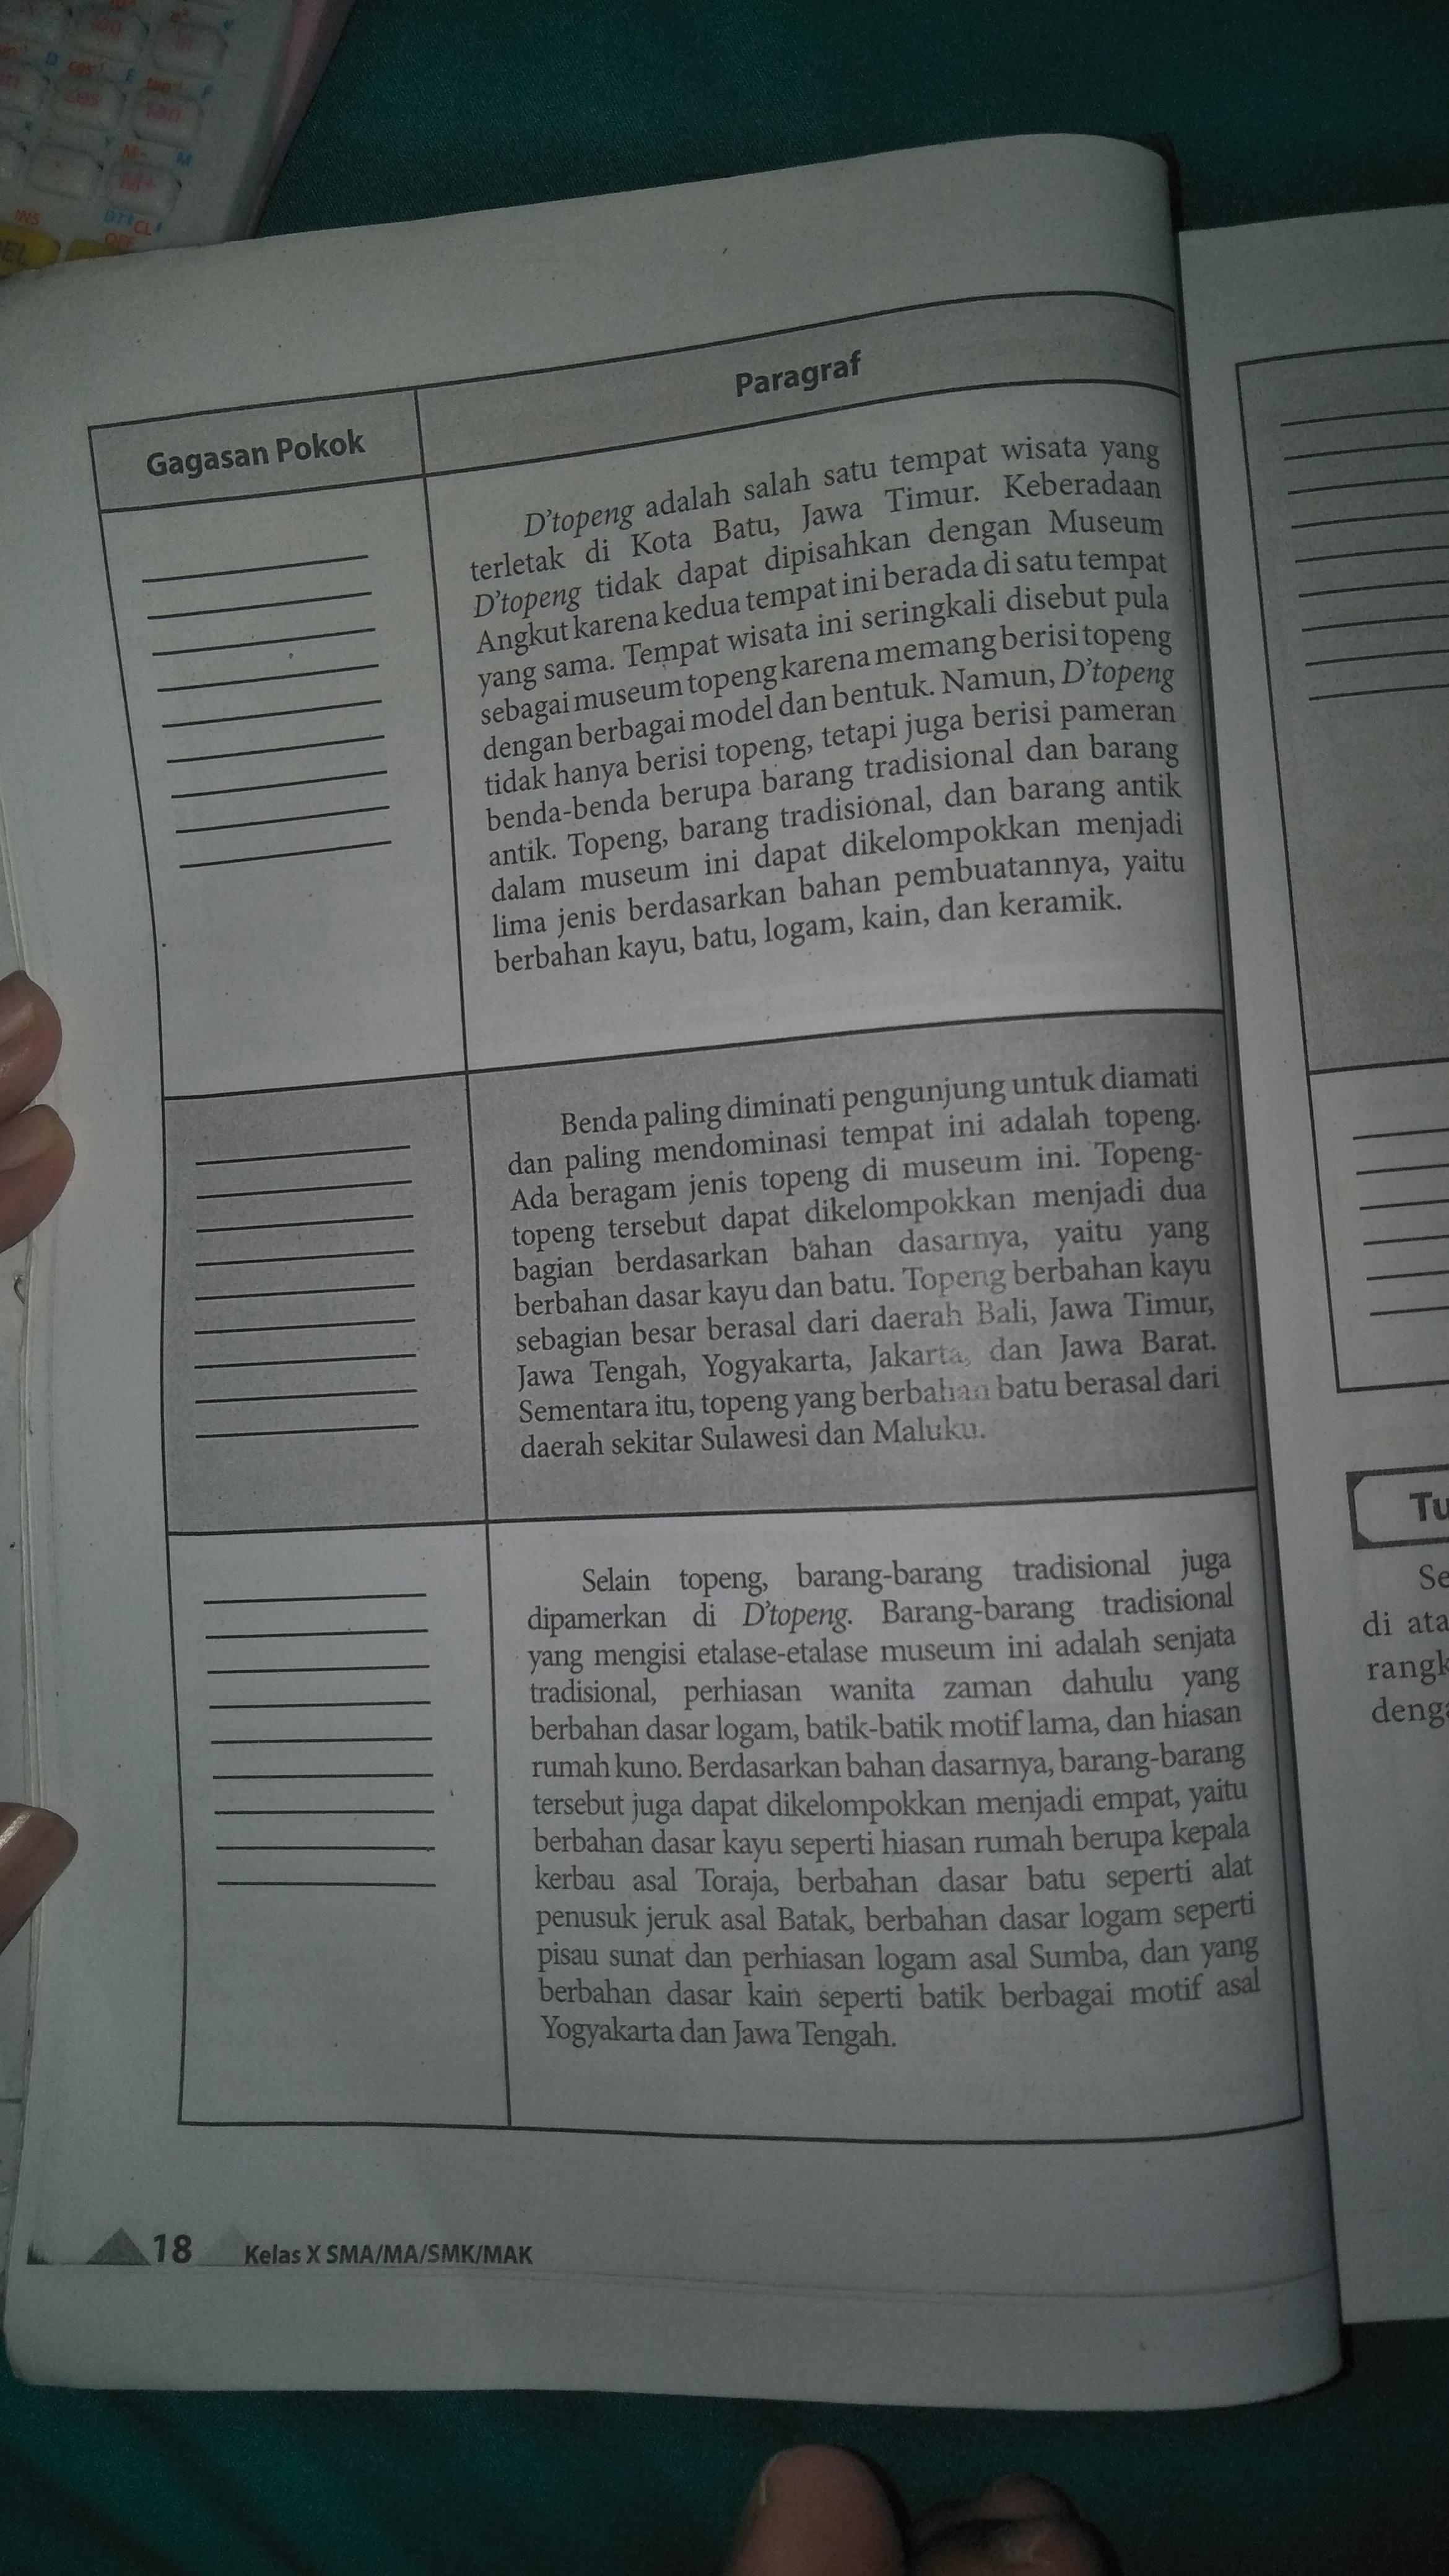 Kunci jawaban lks kreatif matematika sma kelas 10 muse. Jawaban Tabel Tugas 2 Halaman 18 Buku Bahasa Indonesia Kelas 10 Brainly Co Id